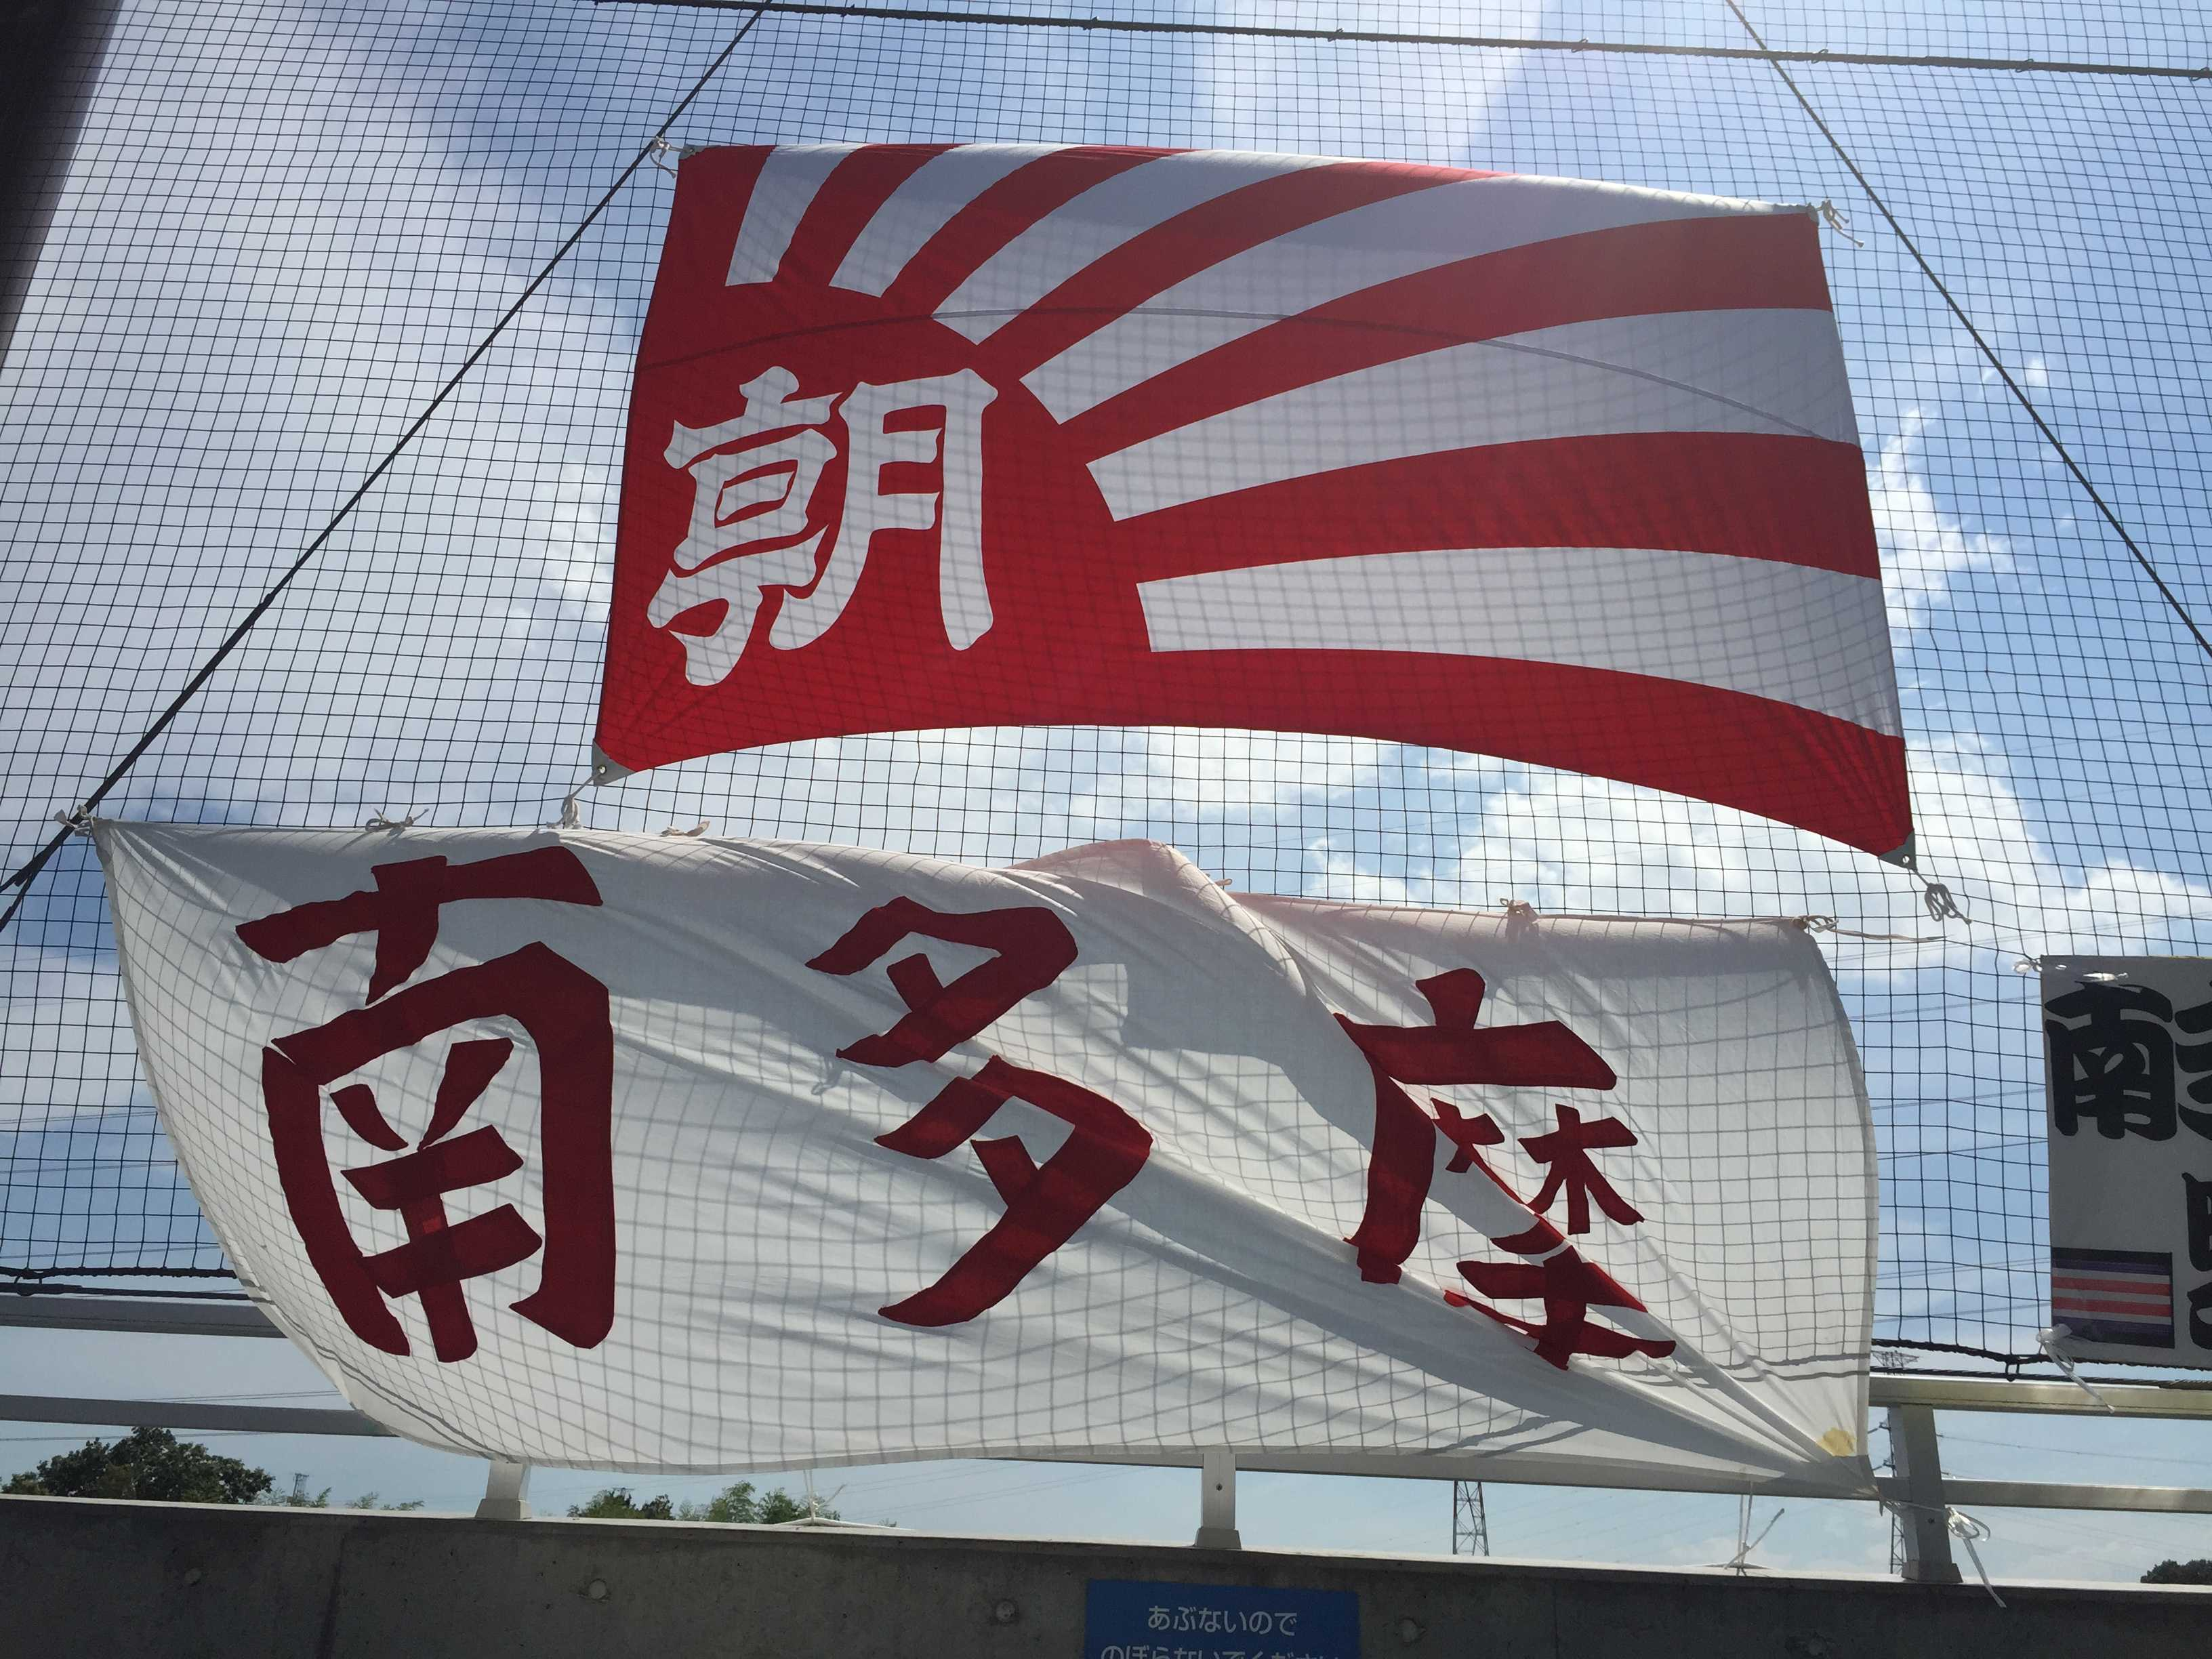 朝日新聞 社旗(上)と南多摩の応援幕(下)